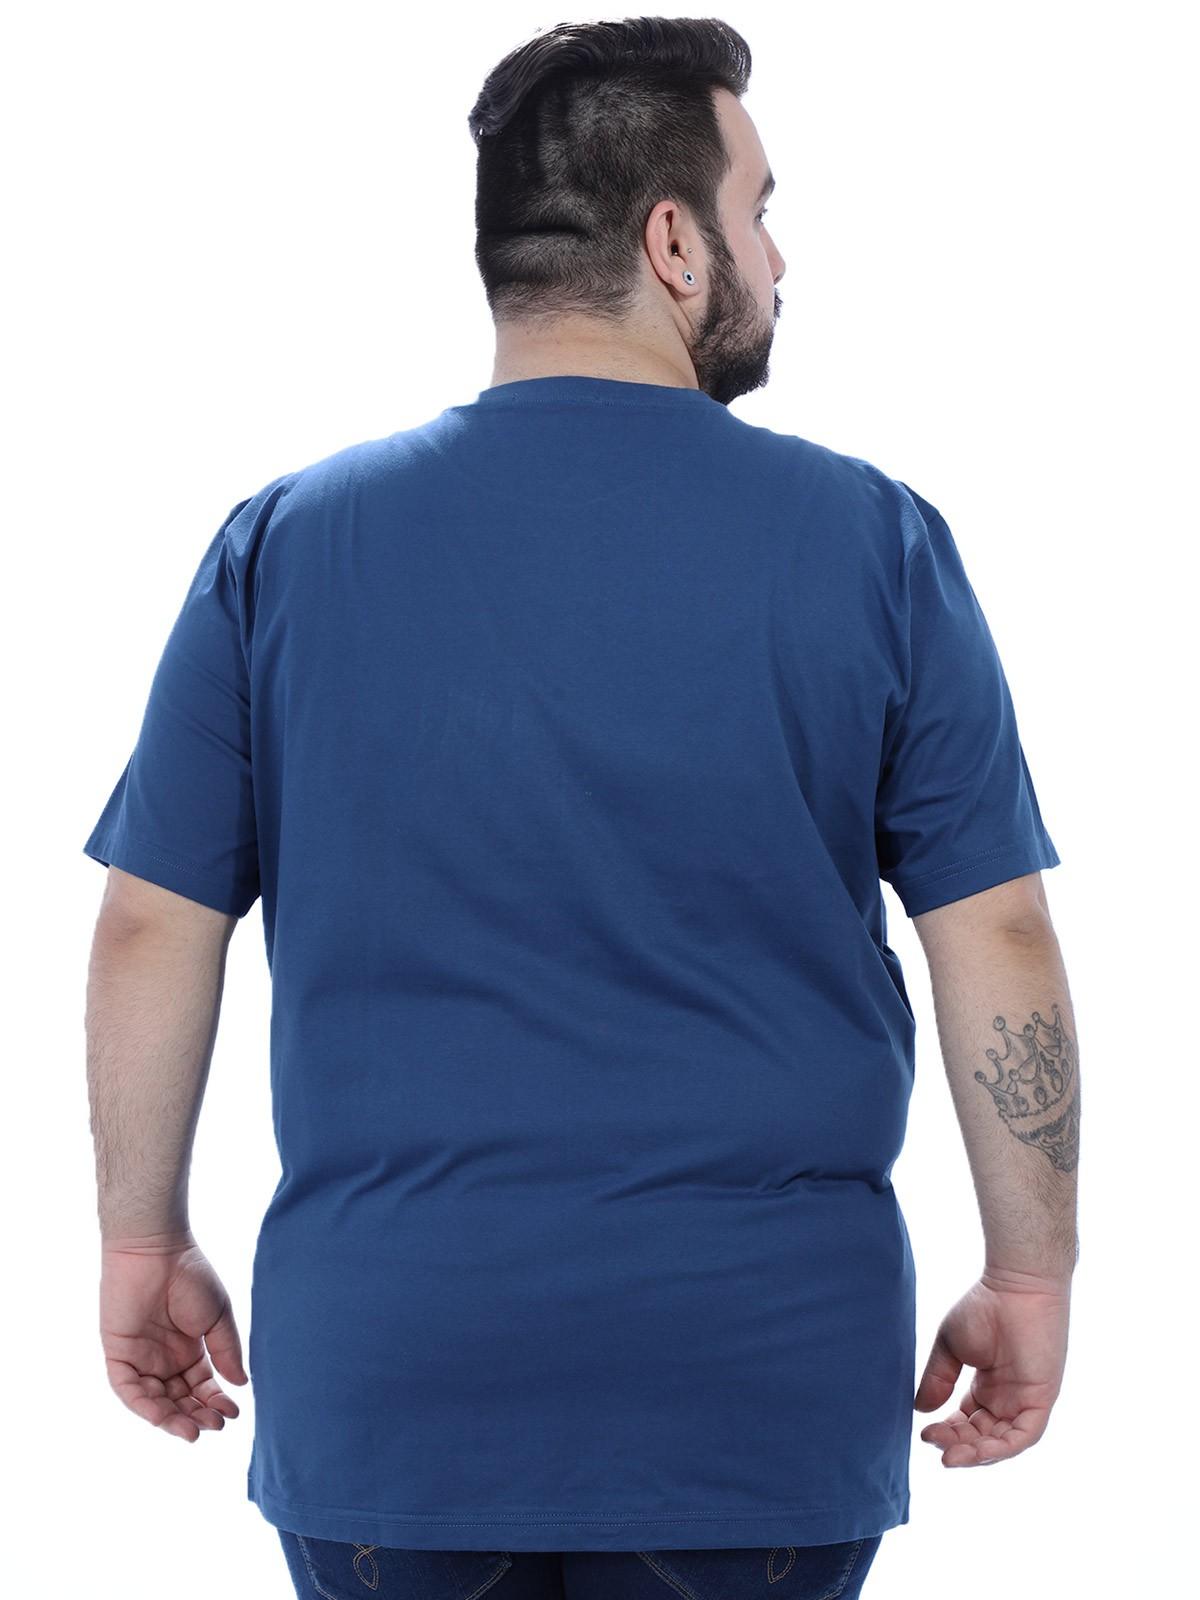 Camiseta Plus Size Careca Hunter Anistia Azul Jeans